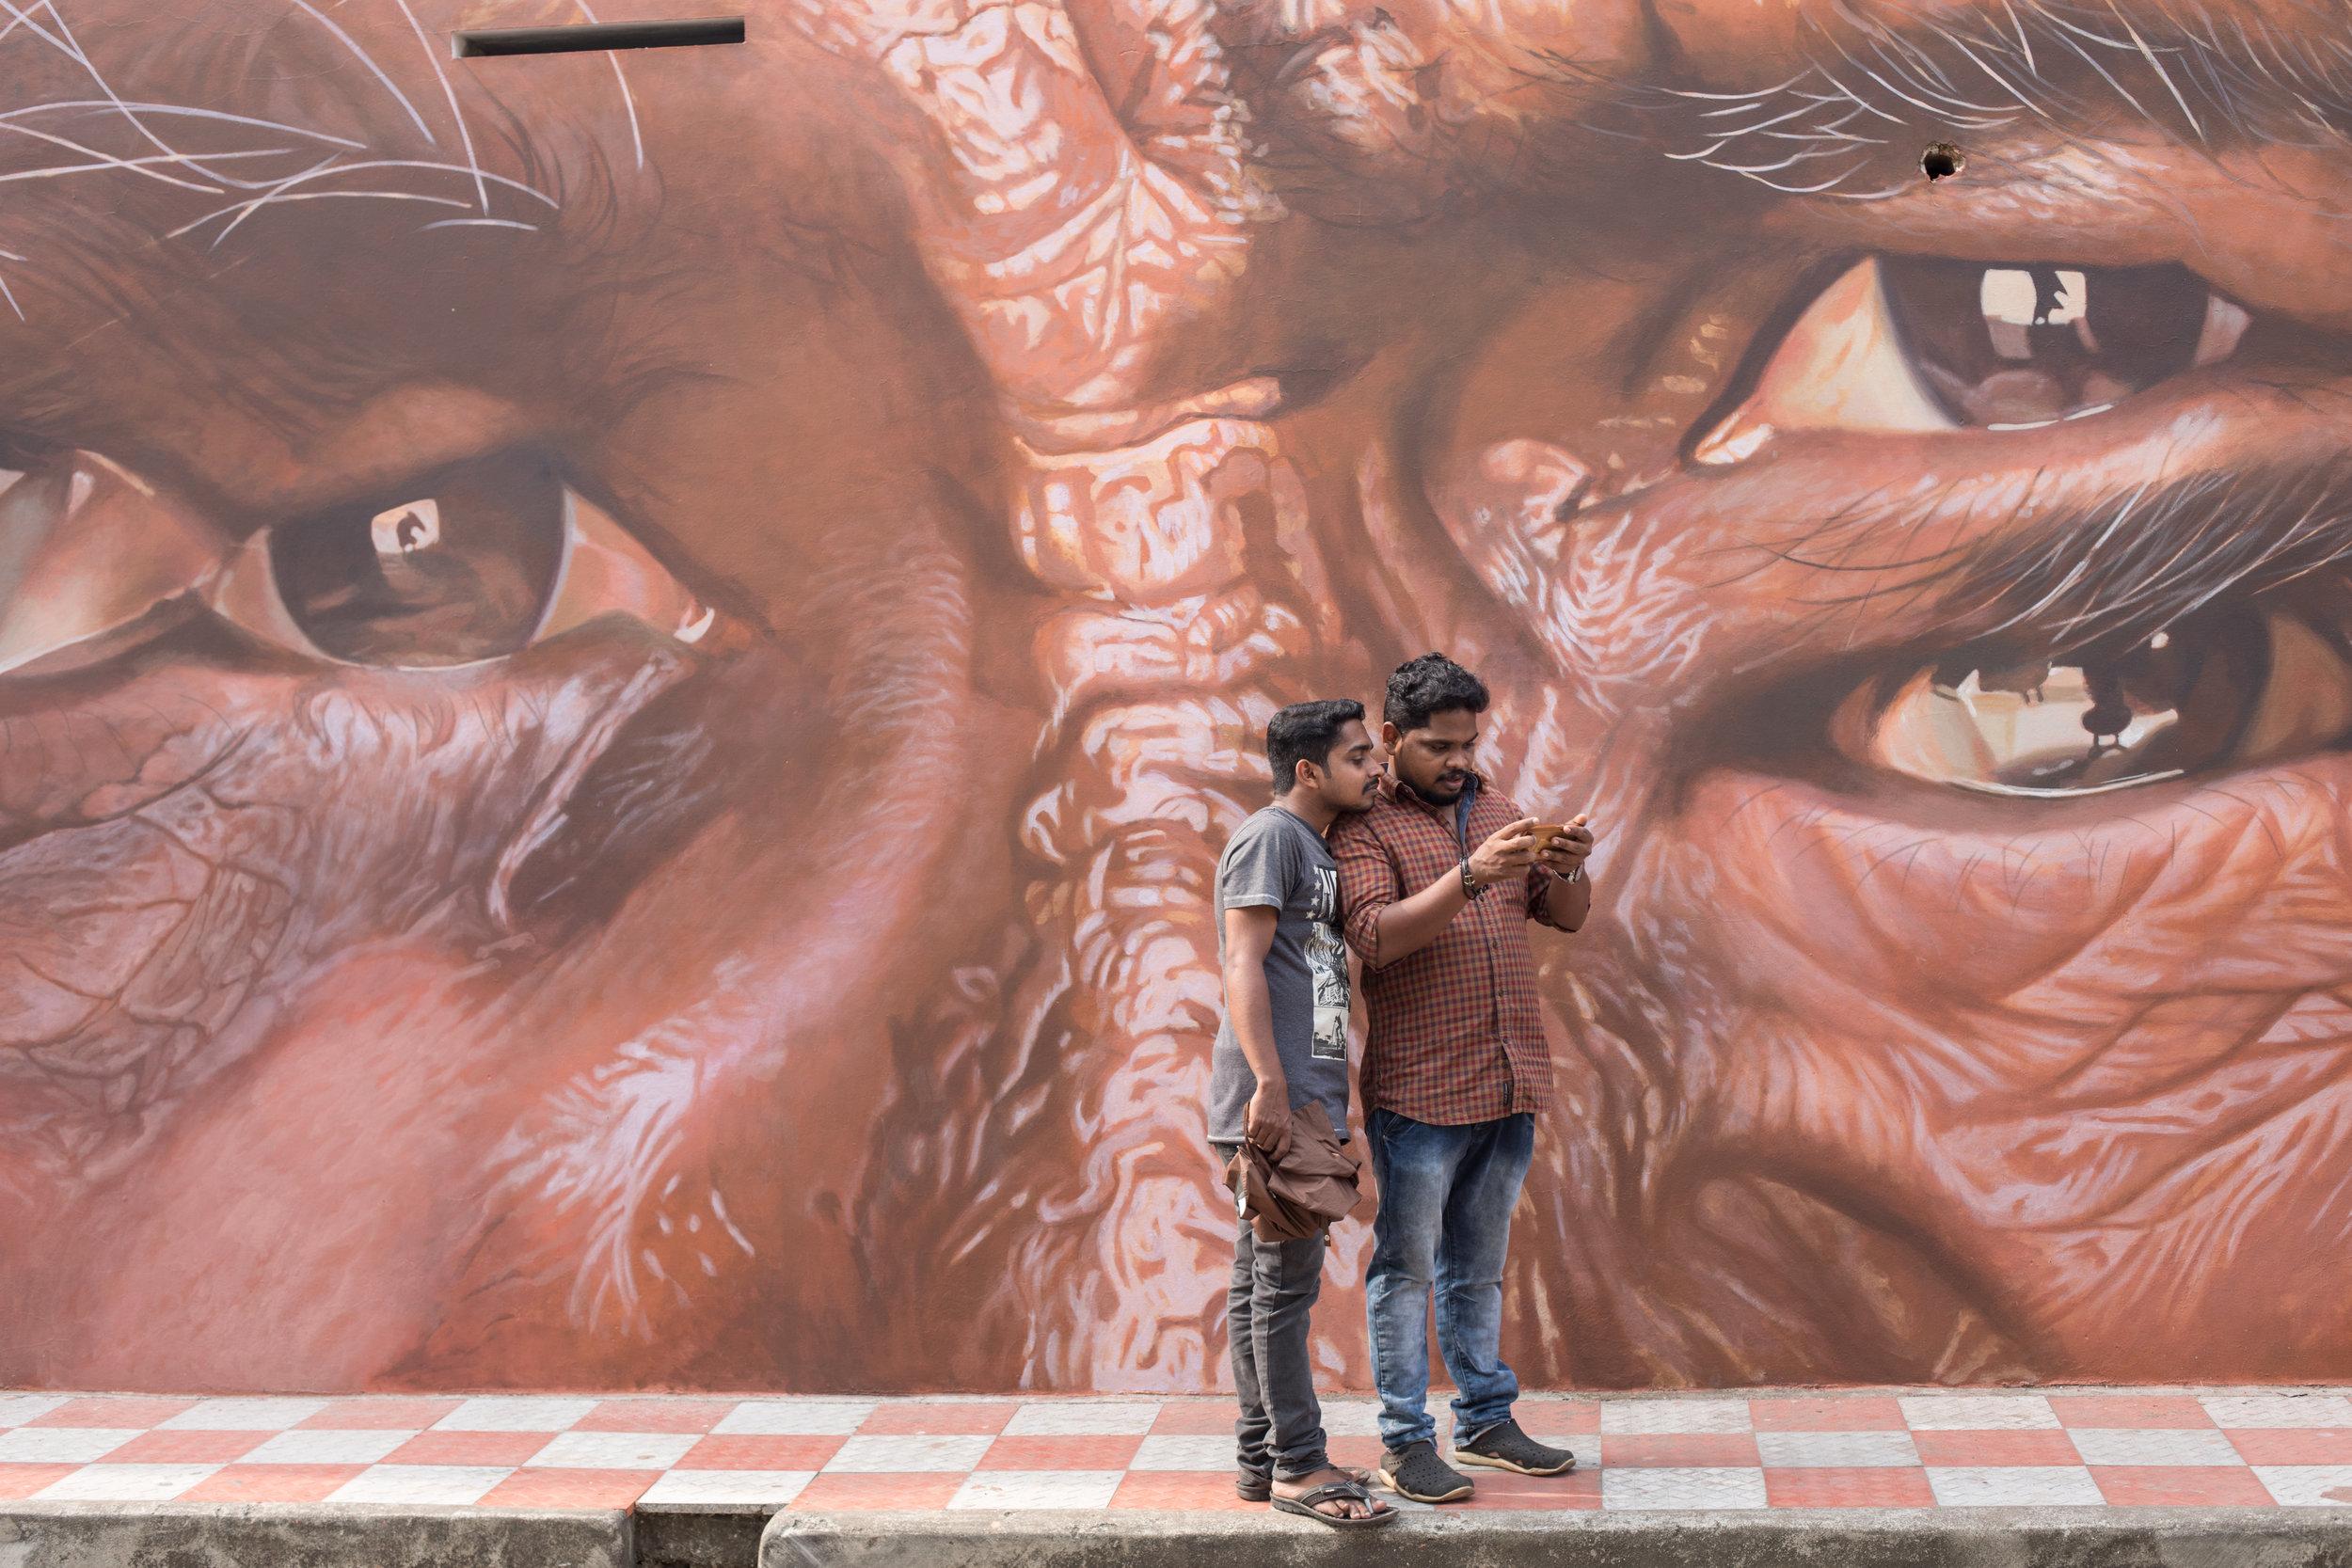 Street Photography and Art at the Kochi-Muziris Biennale 2018.